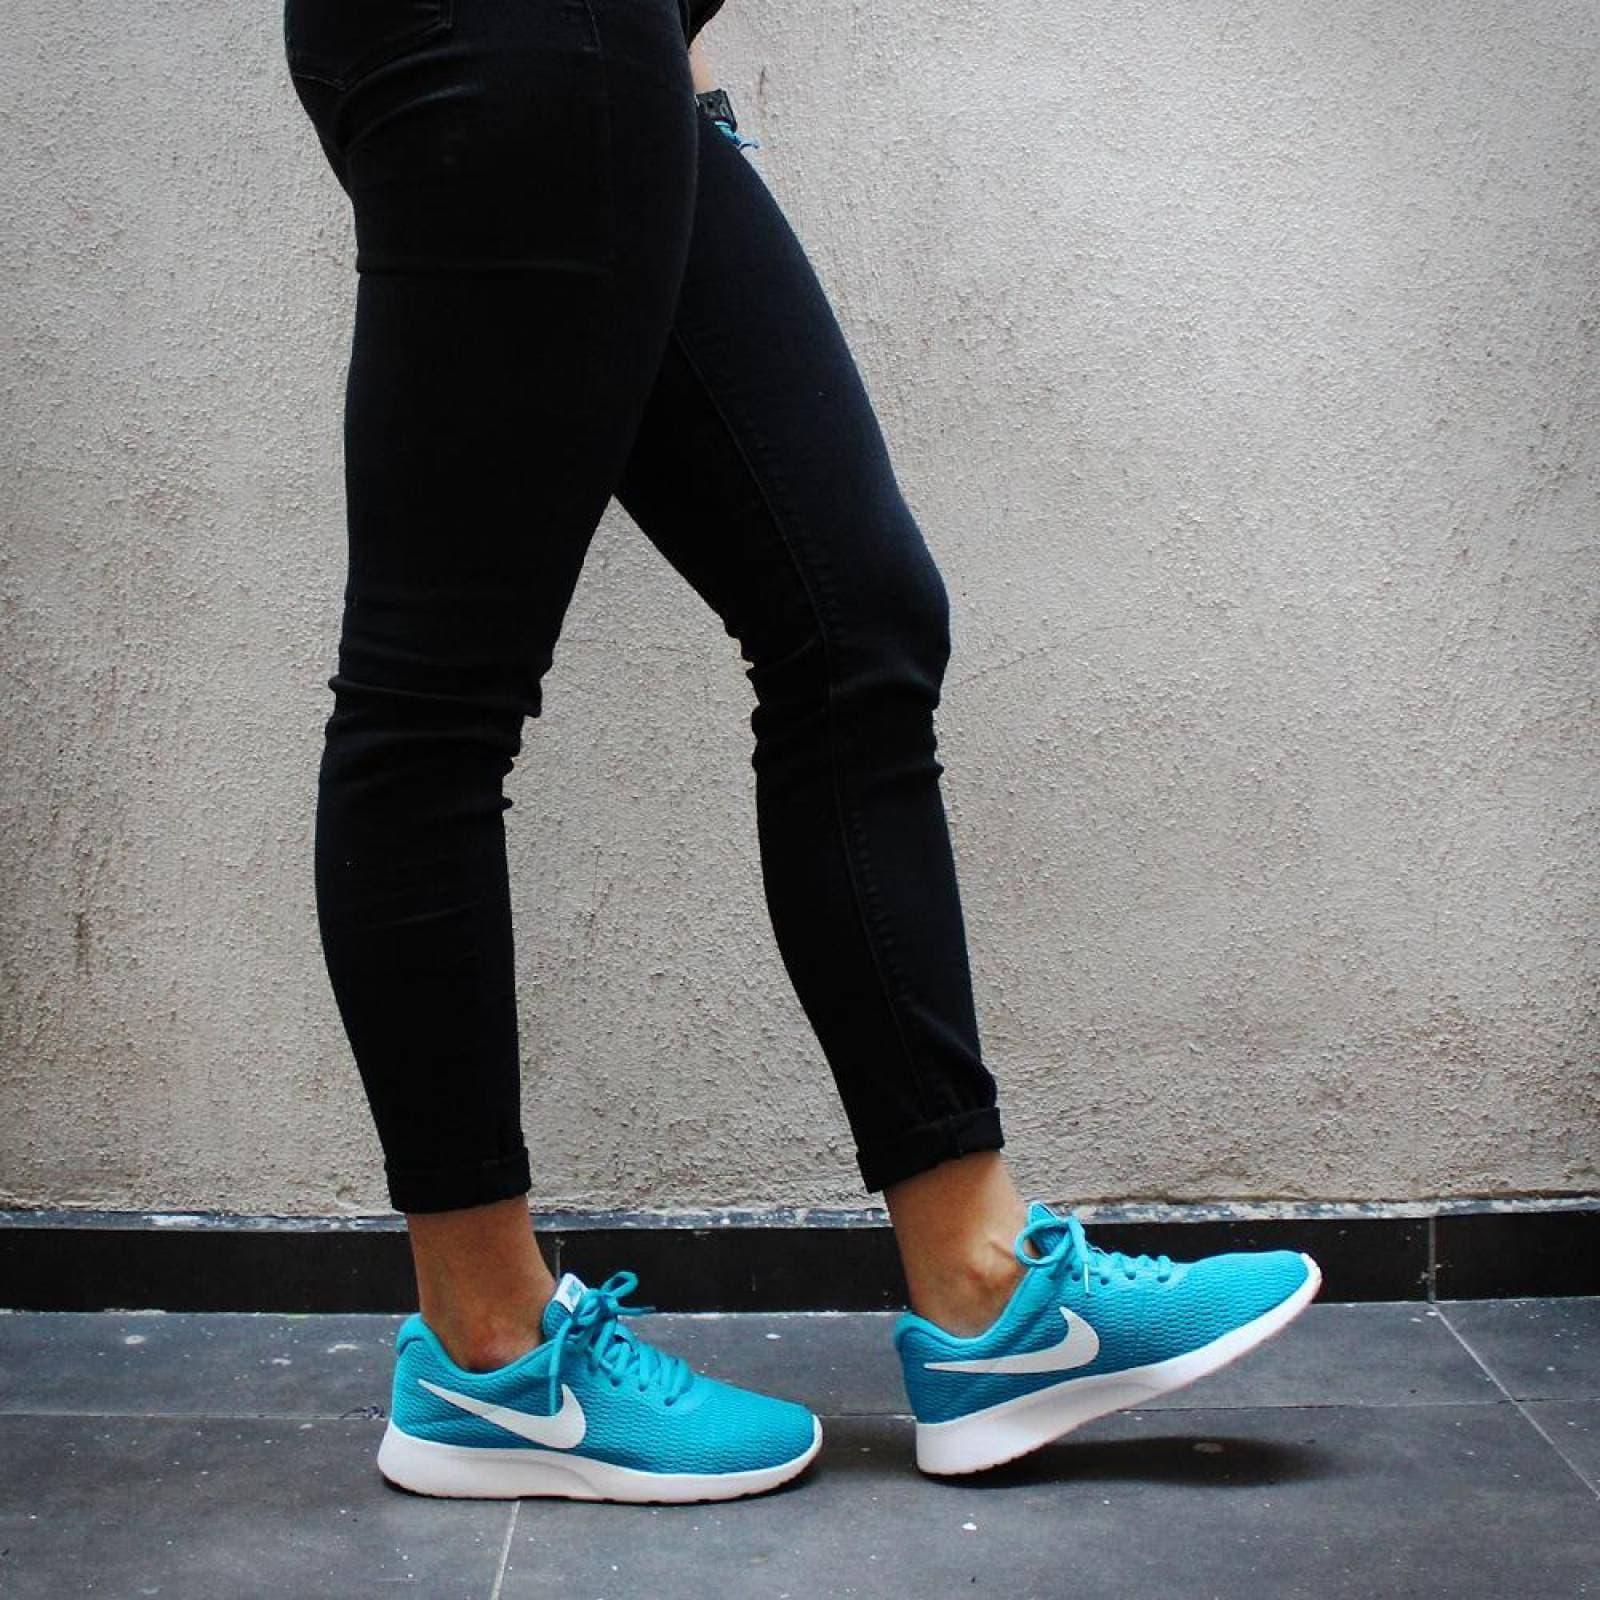 archivo Agencia de viajes recluta  Tenis Nike Tanjun 812655405 Turquesa Mujer